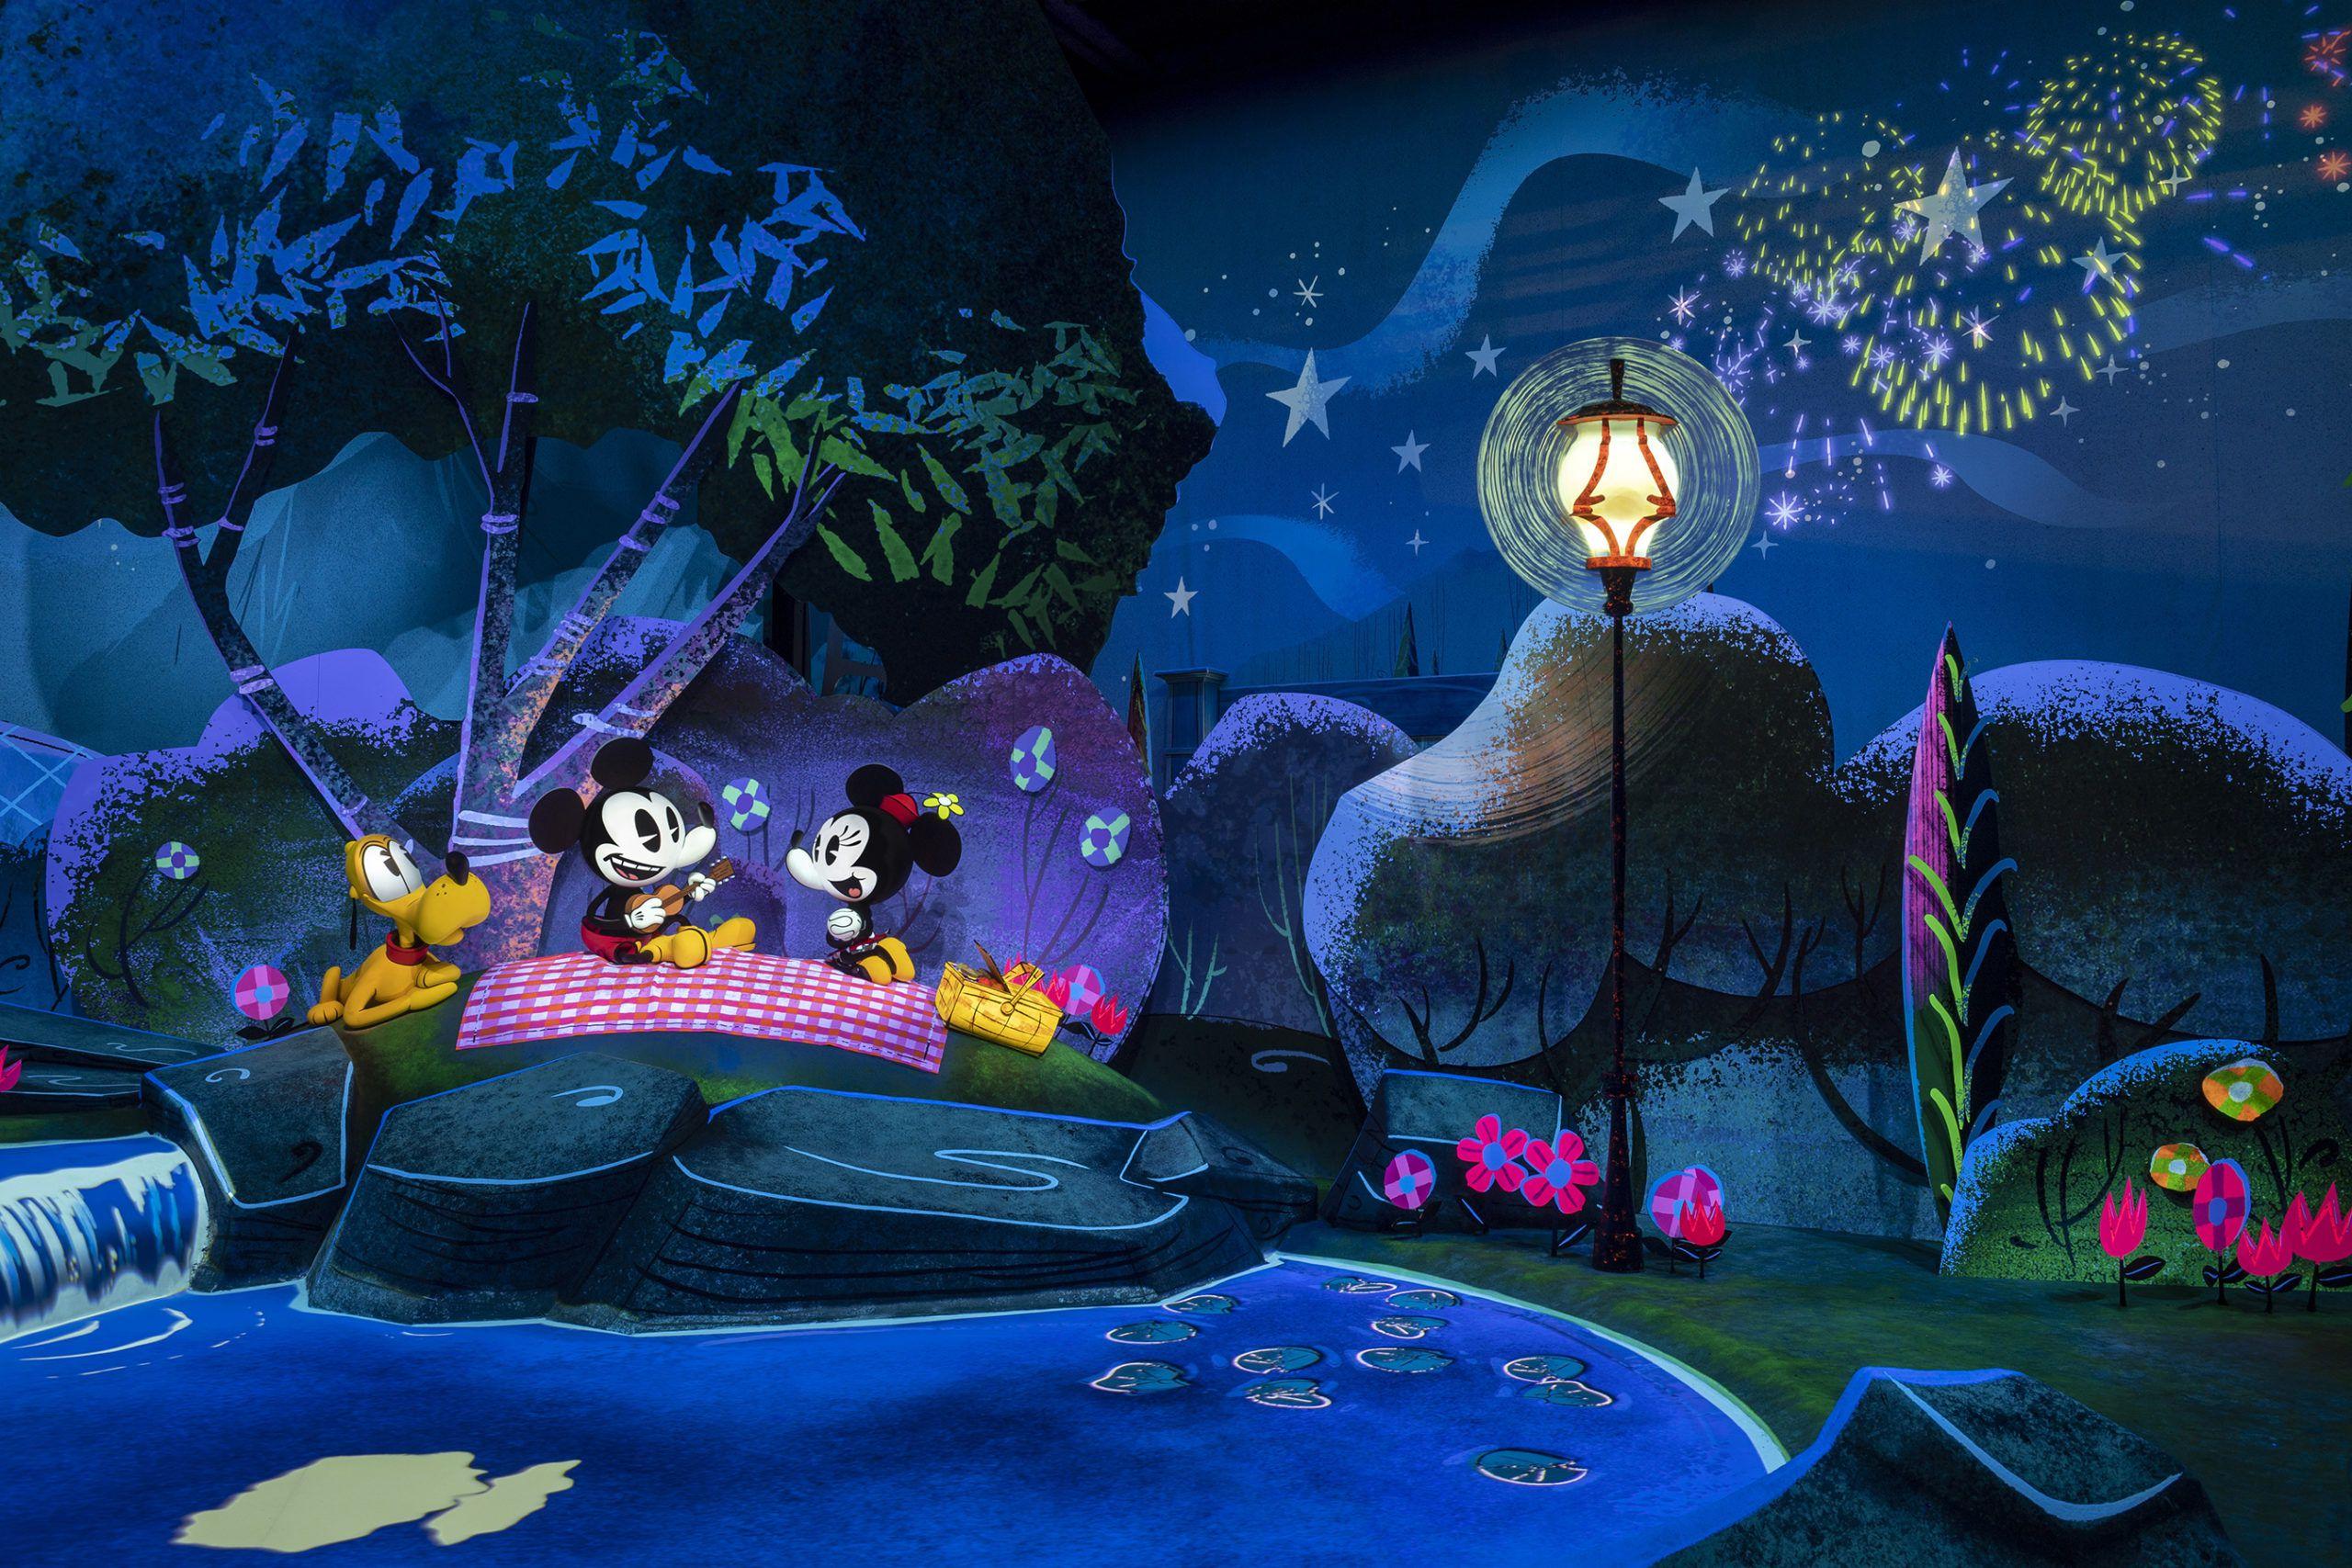 Enter the Cartoon World on Mickey & Minnie's Runaway Railway